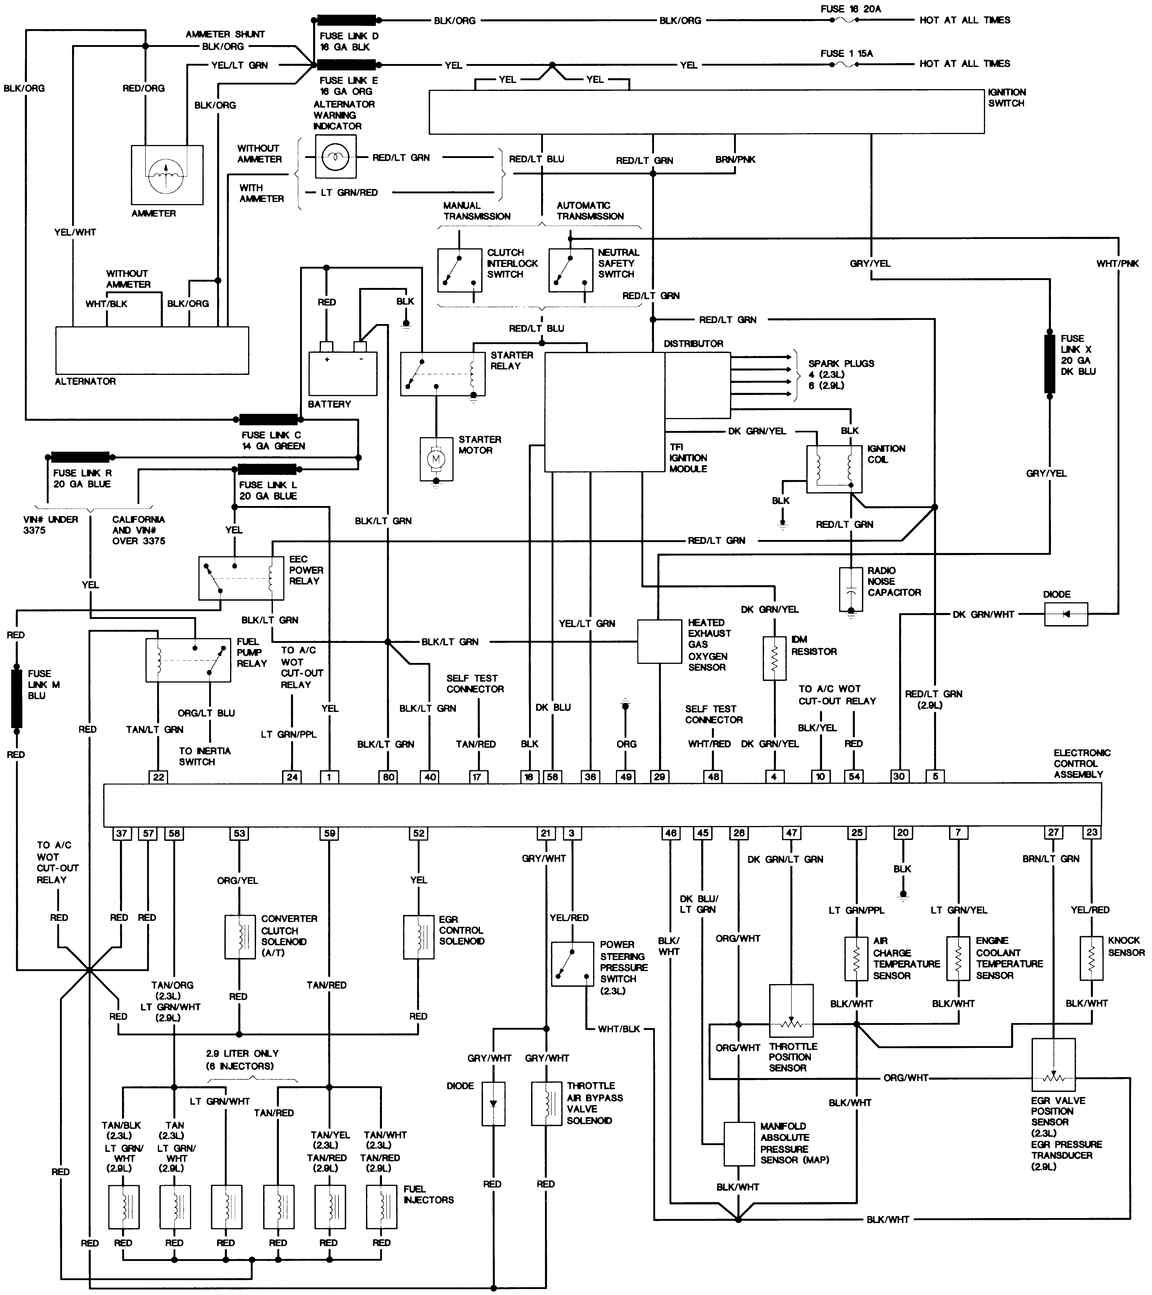 32 1995 honda accord fuse box diagram